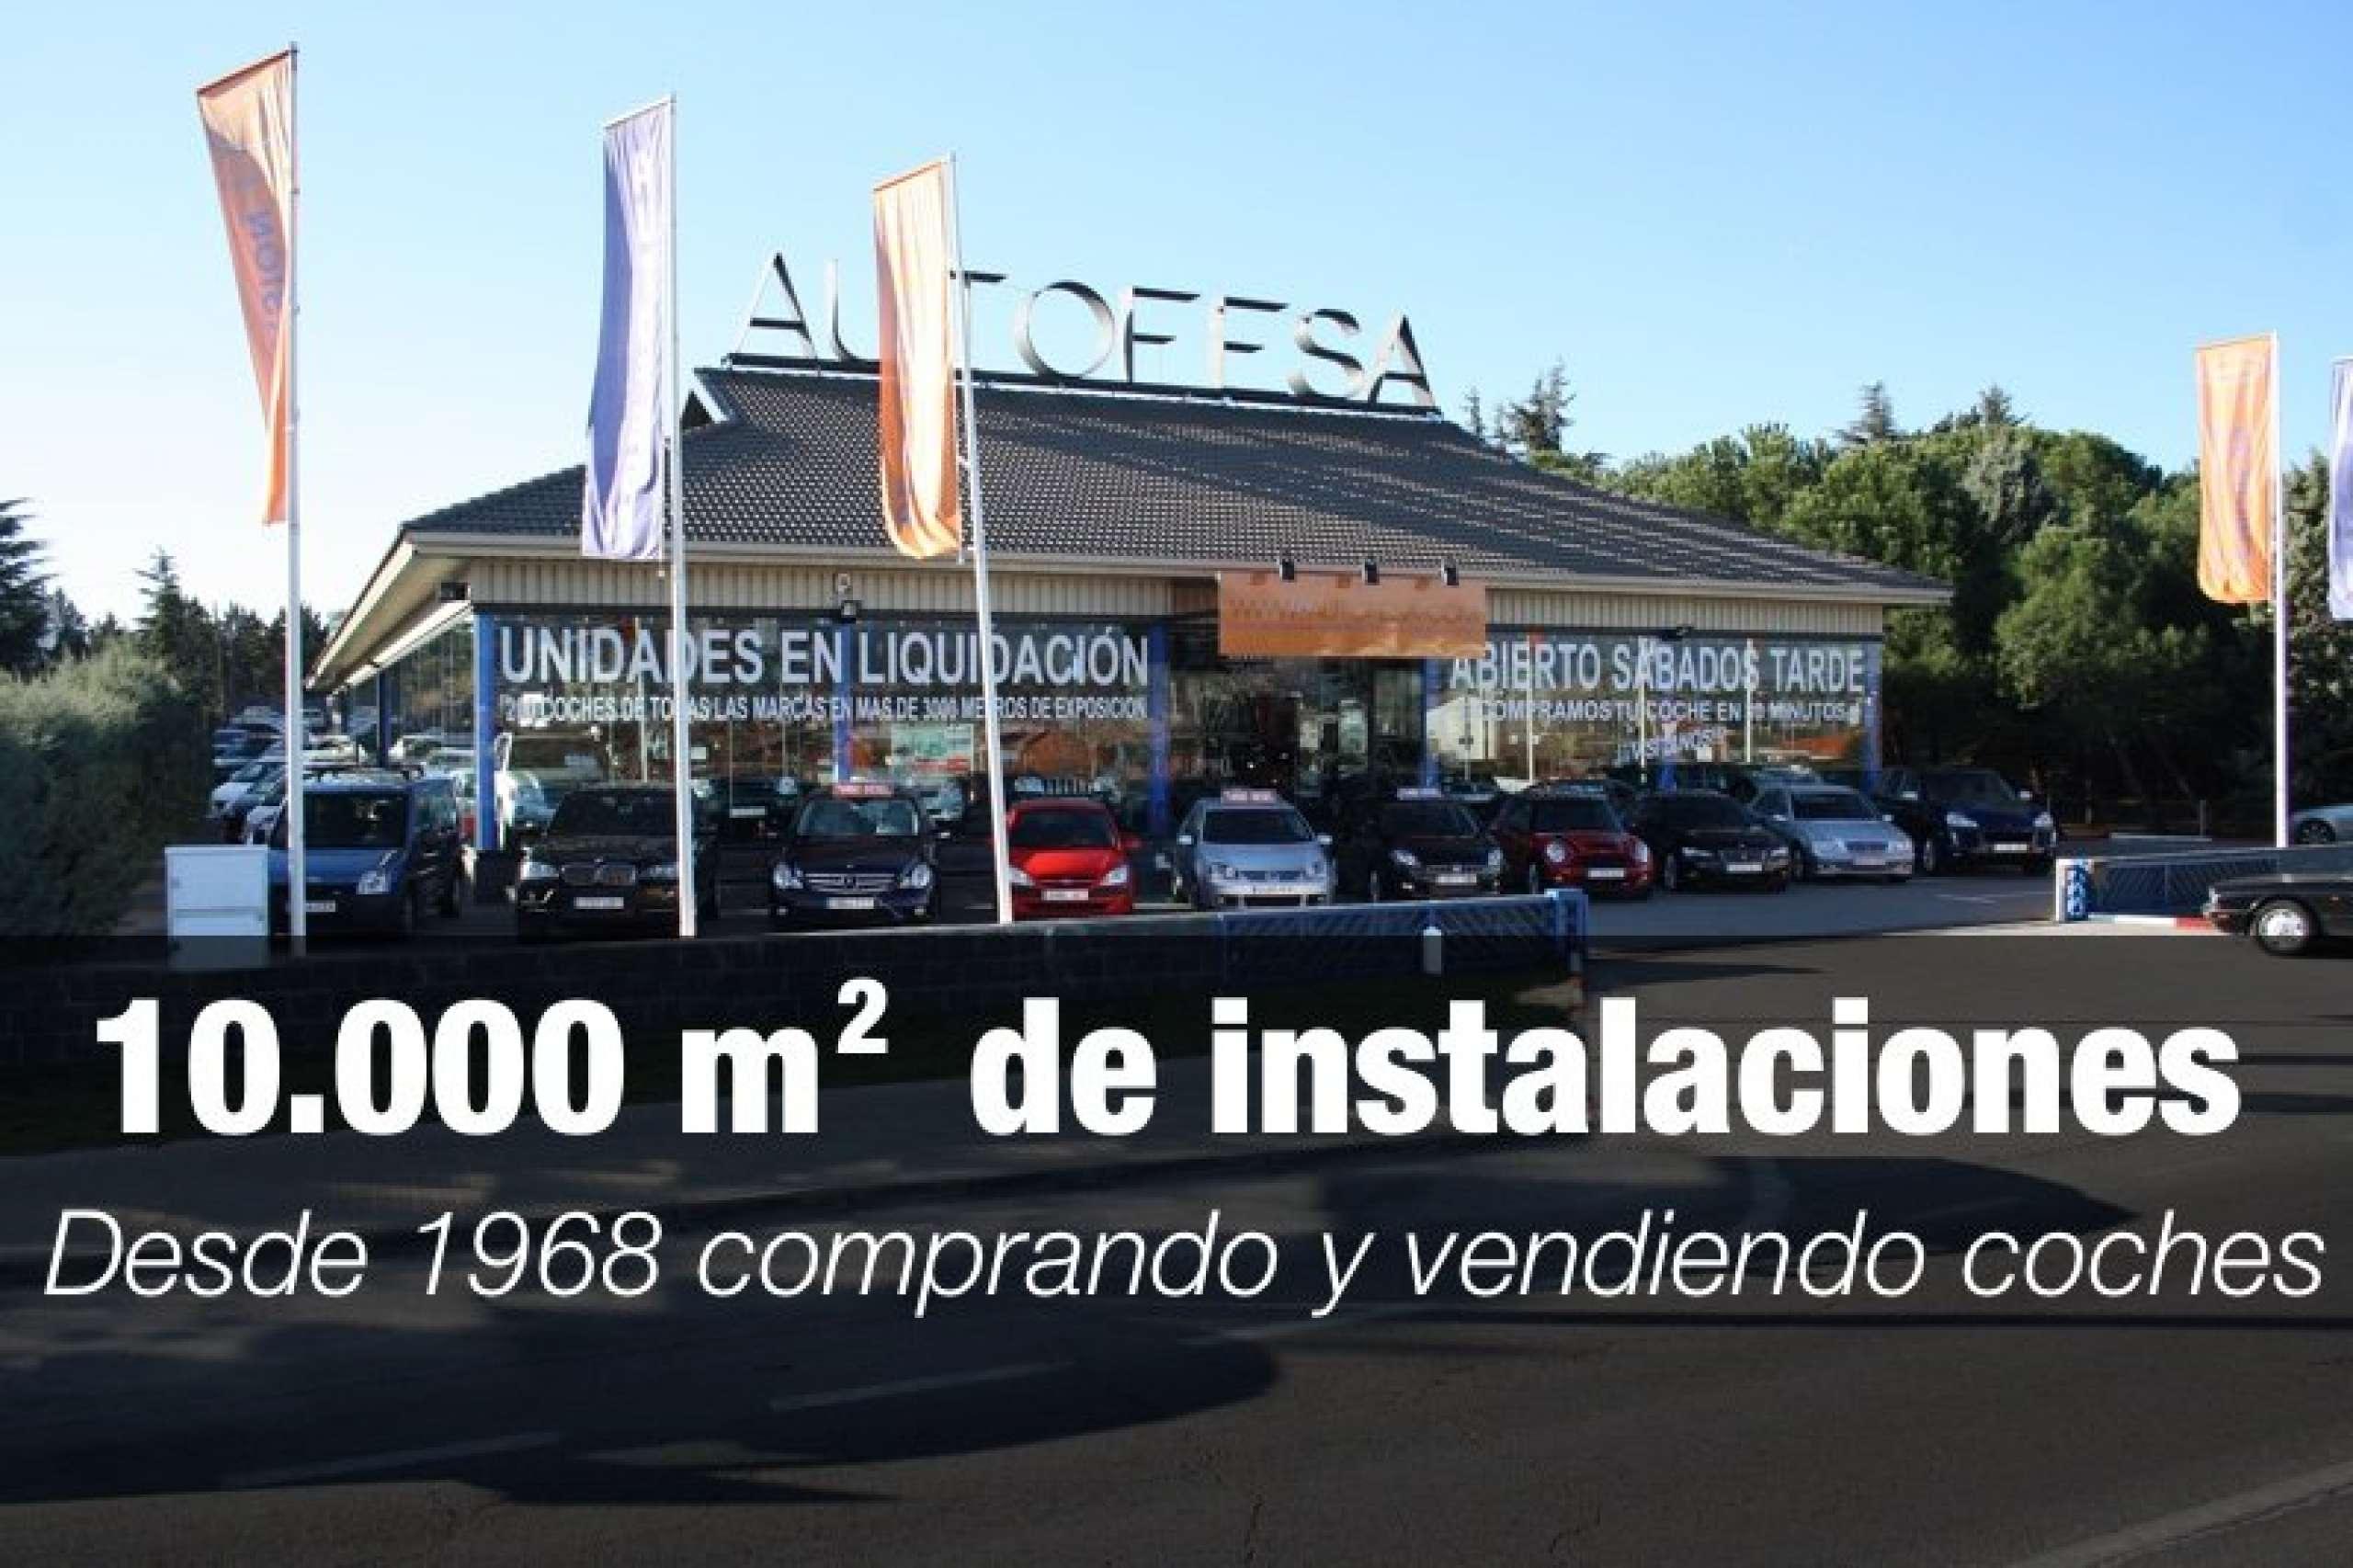 Lexus Ct 200h 1.8 136cv Eco Auto 5p - Foto 18